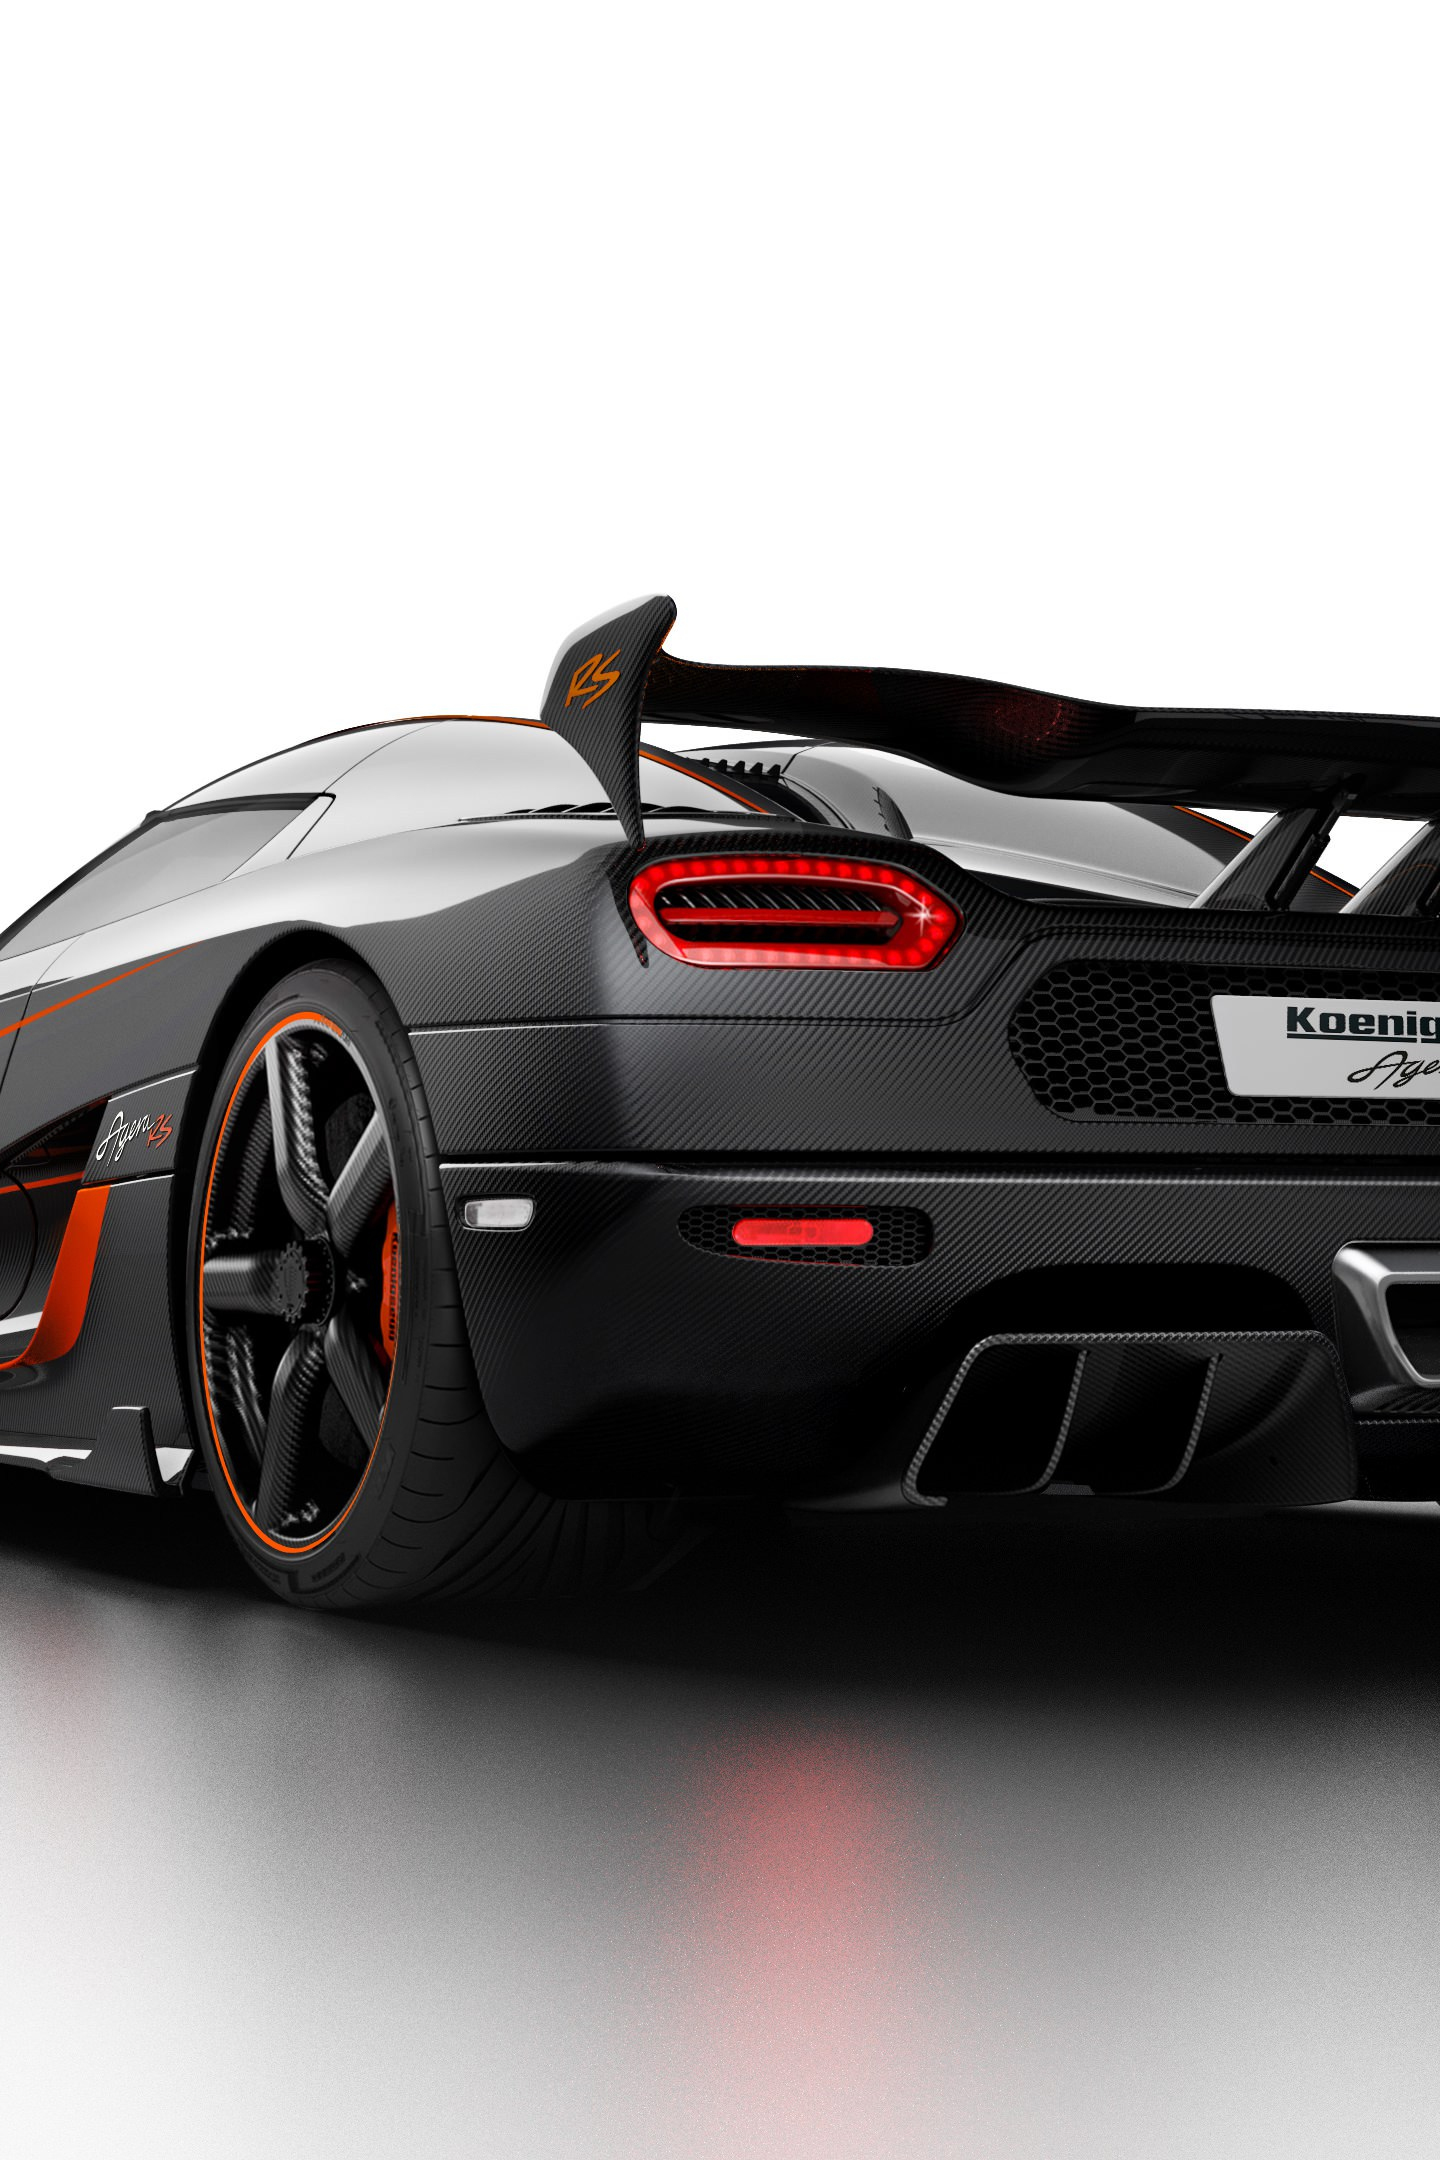 Koenigsegg Agera RS, sports car, rear, 1440x2880 wallpaper